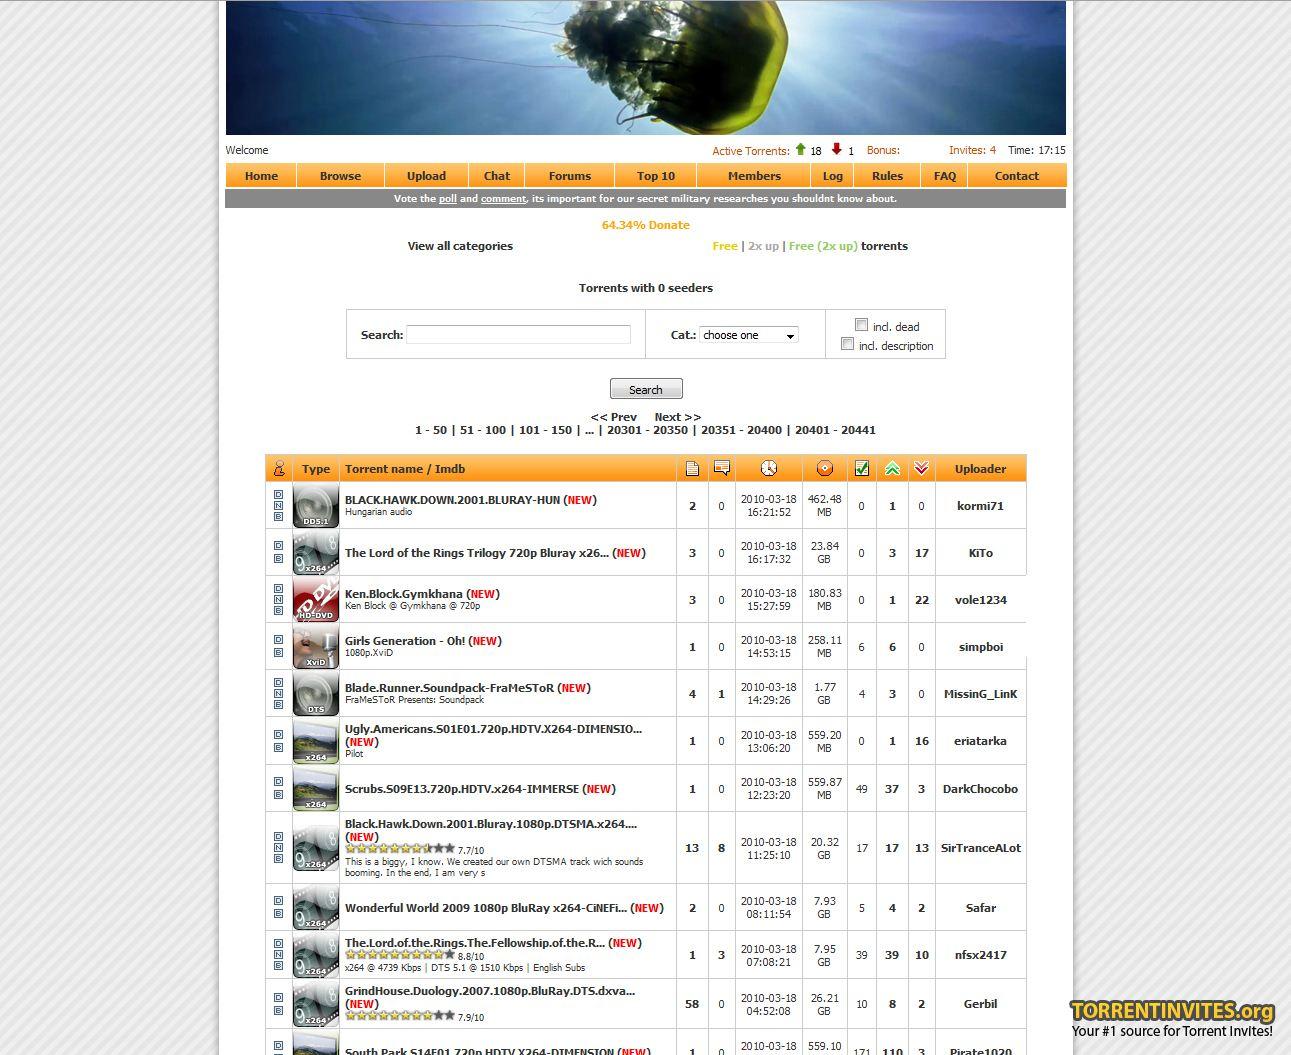 BeehadTheRavinesHINDIMOVIEwithtorrent 163Bit_HDTV_20Browse